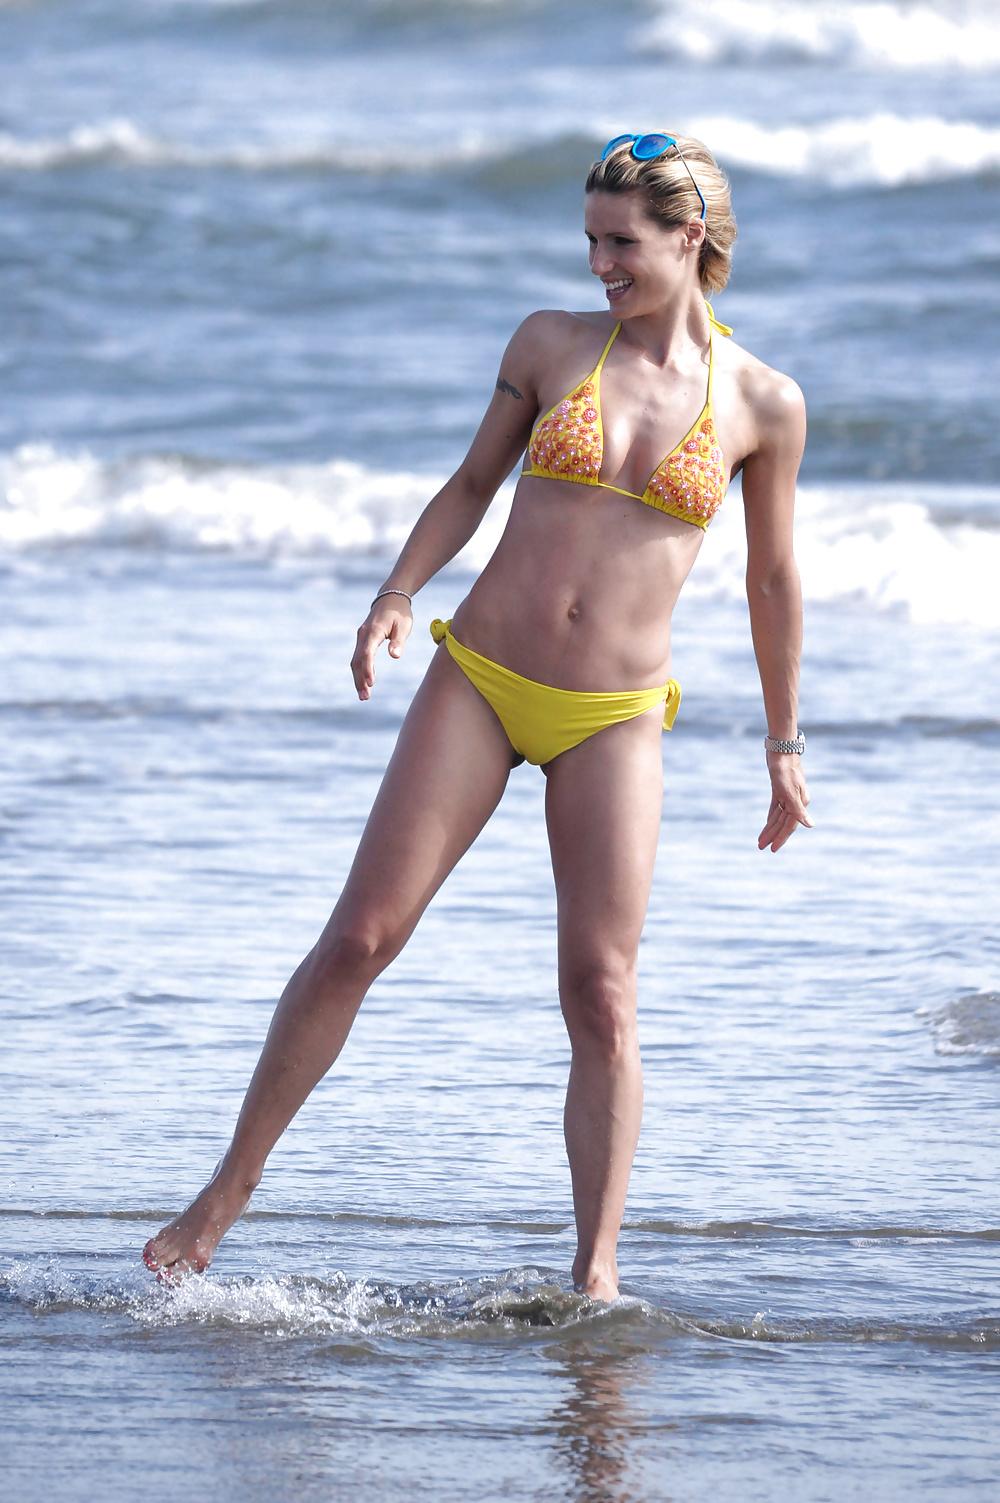 Minni the mucha get a new bikini and strip naked again - 3 part 3